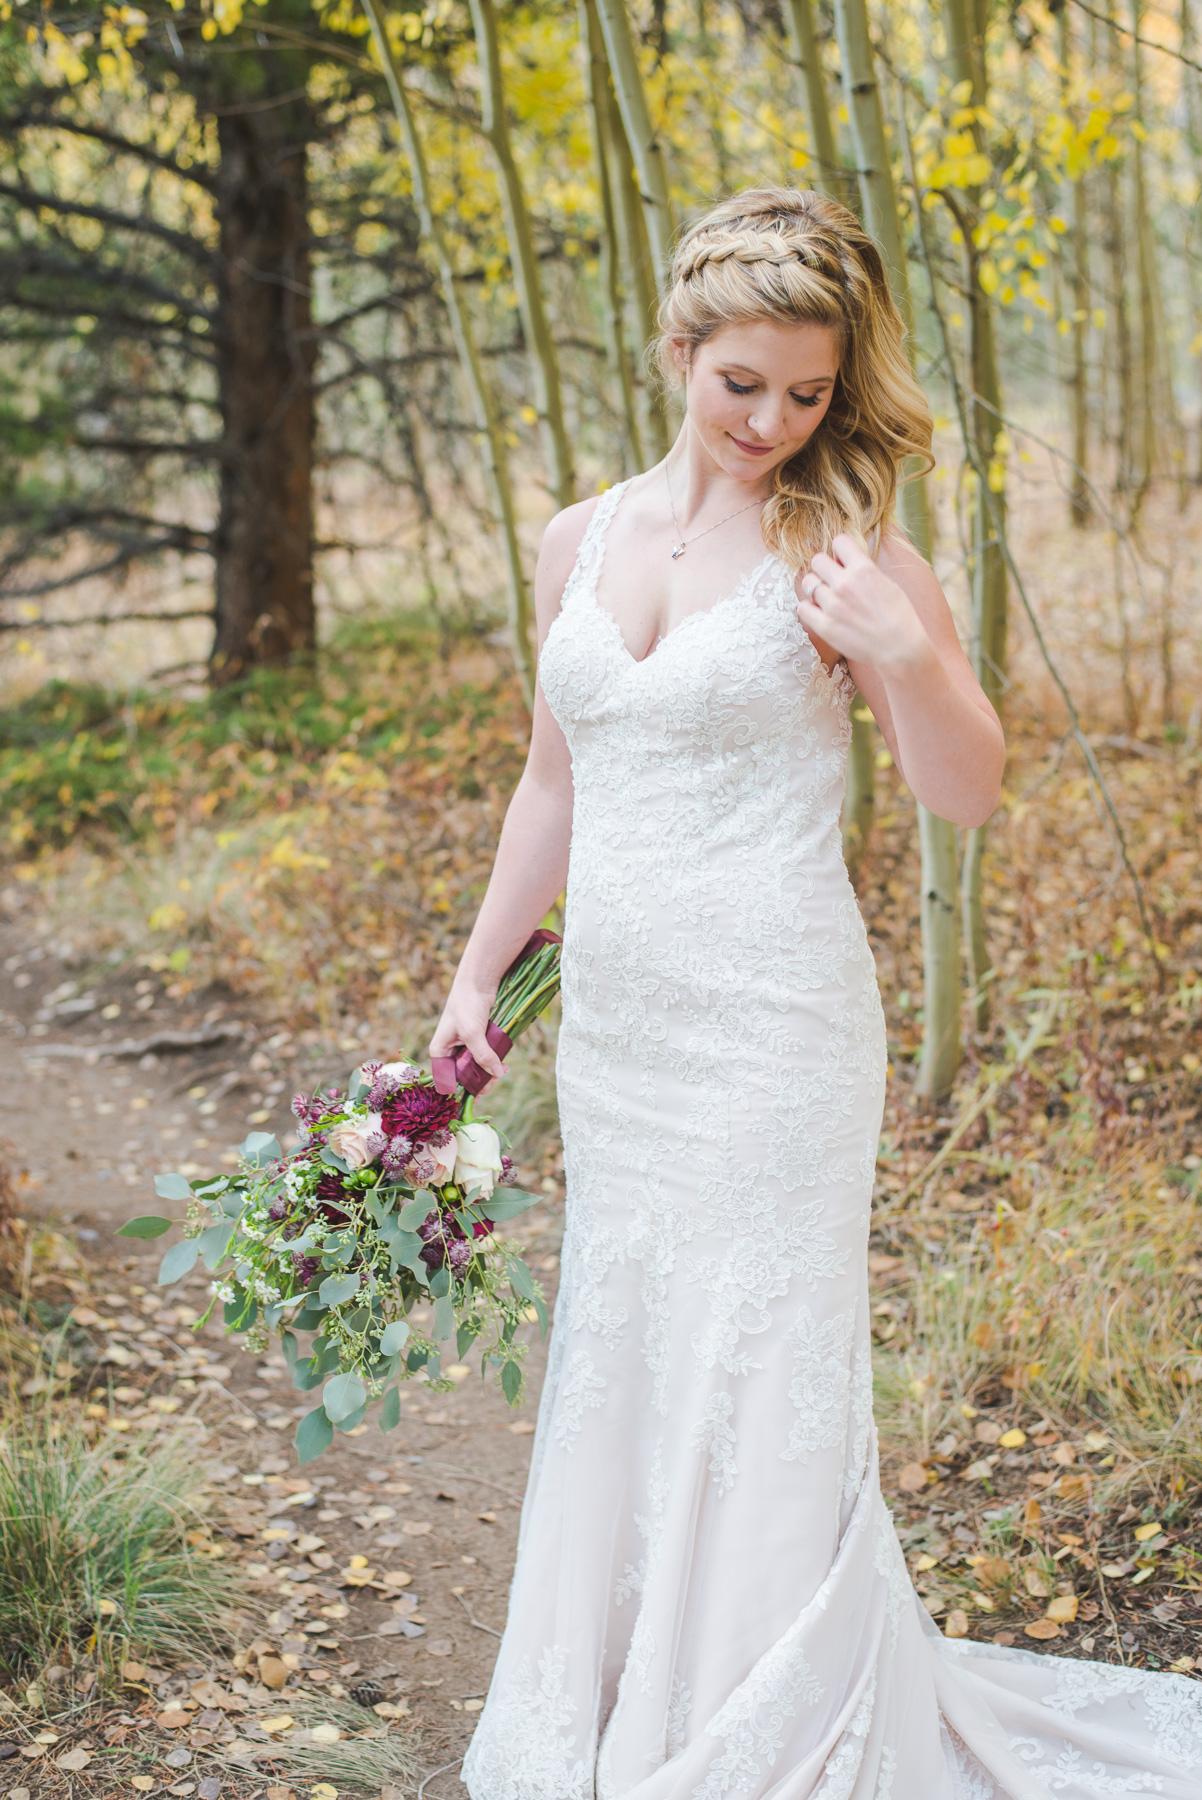 Beautiful bride in the fall |Autumn elopement in Breckenridge, Colorado | Summit Mountain Weddings